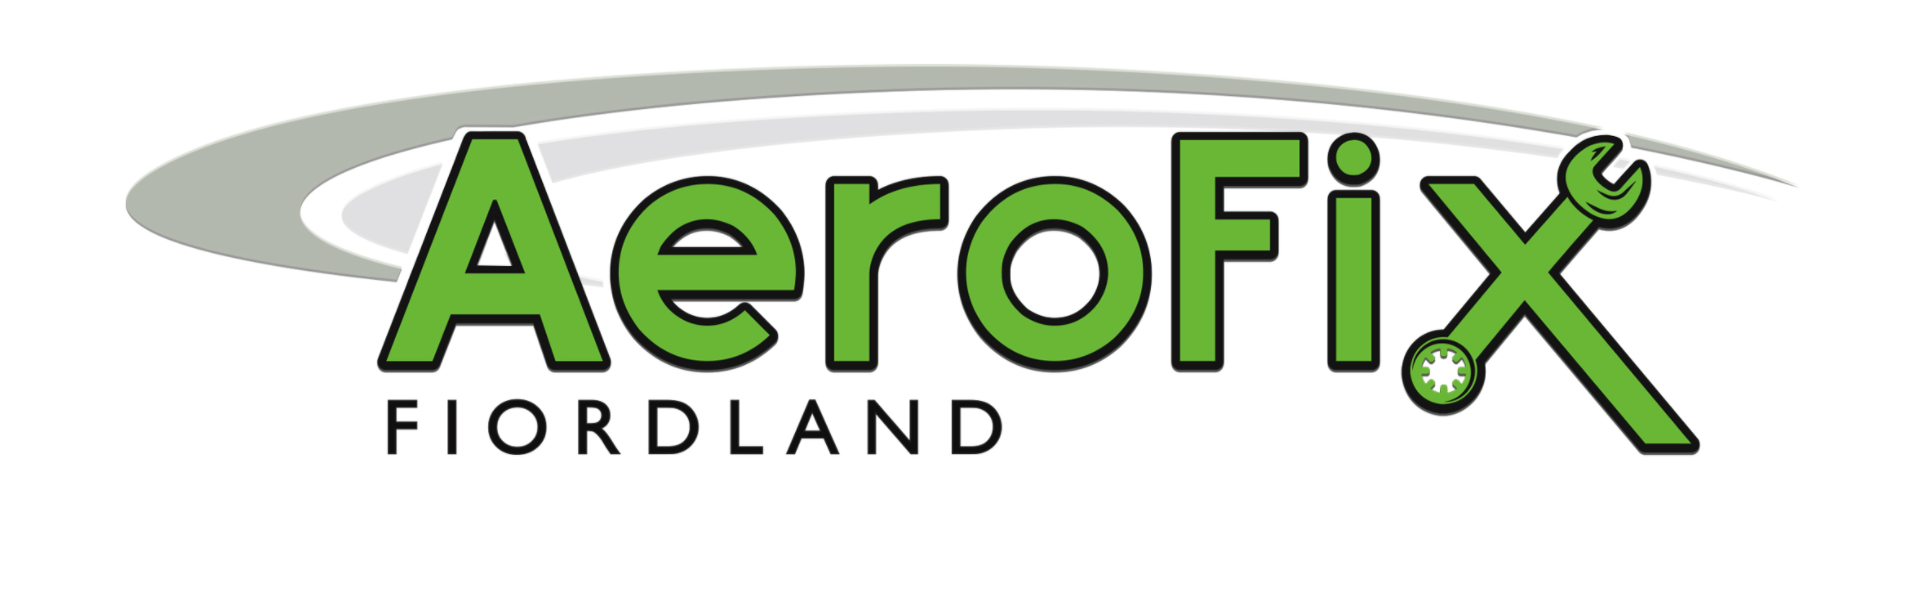 AeroFix Fiordland